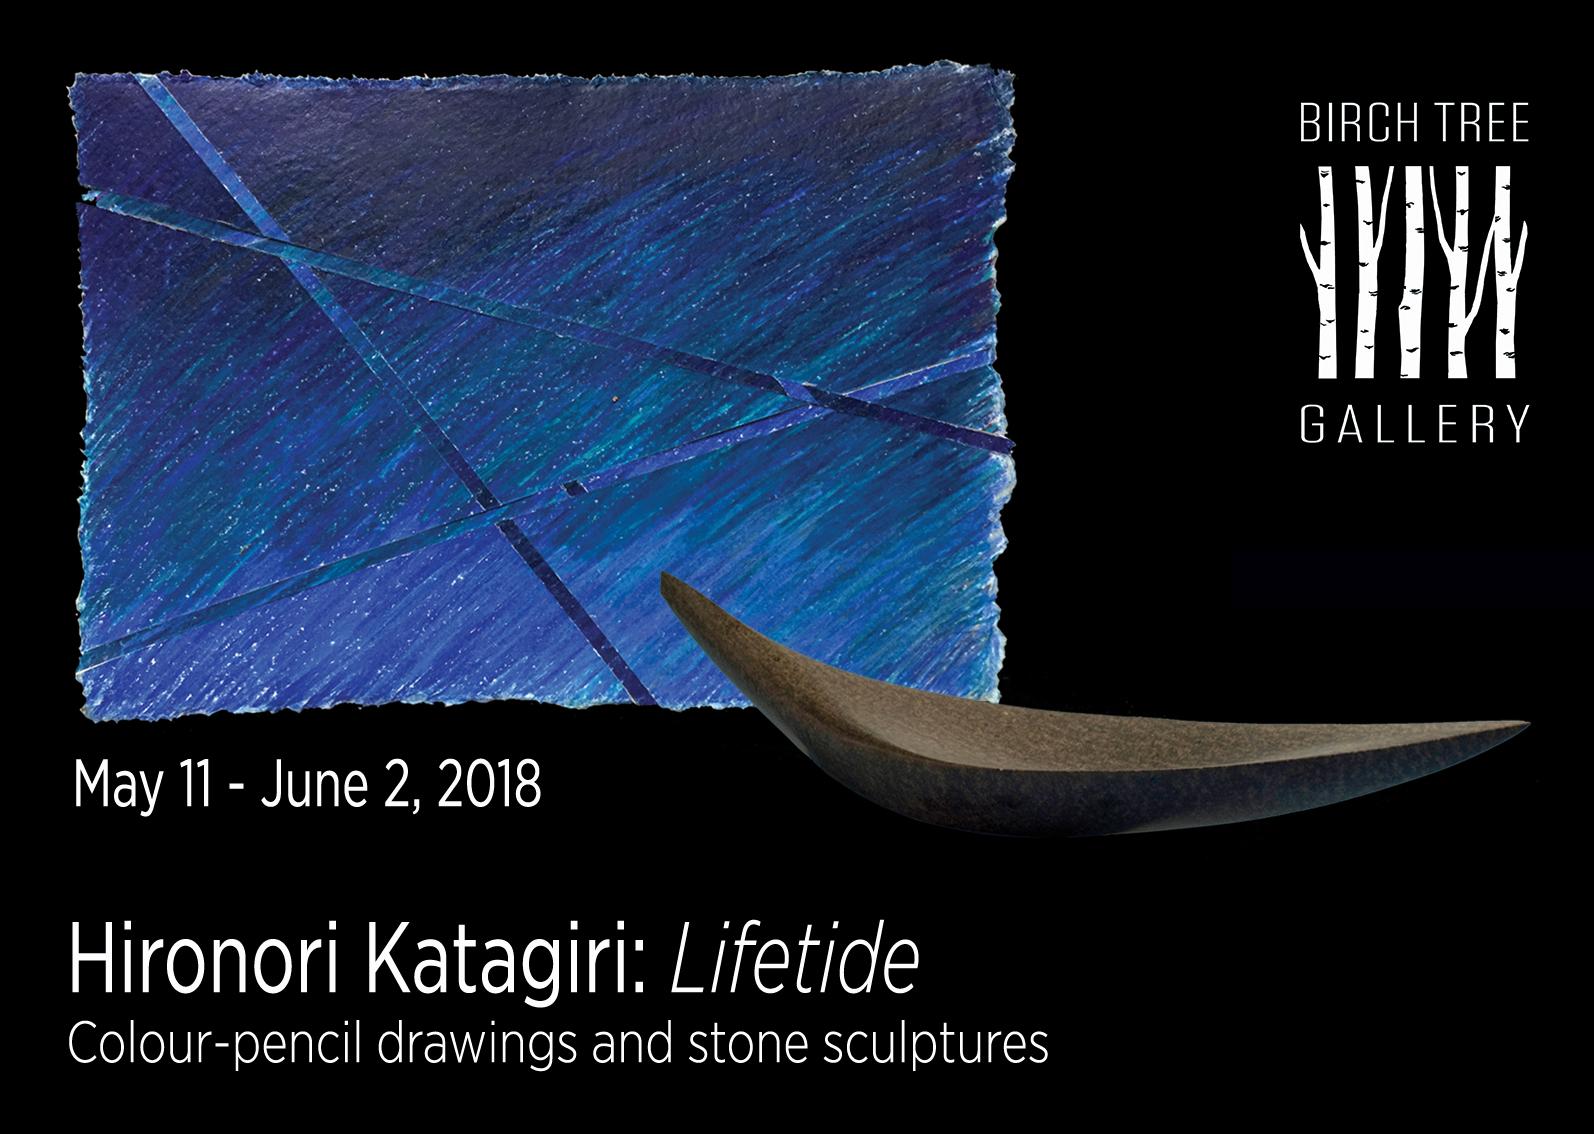 Hironori Katagiri 'Lifetide' at Birch Tree Gallery